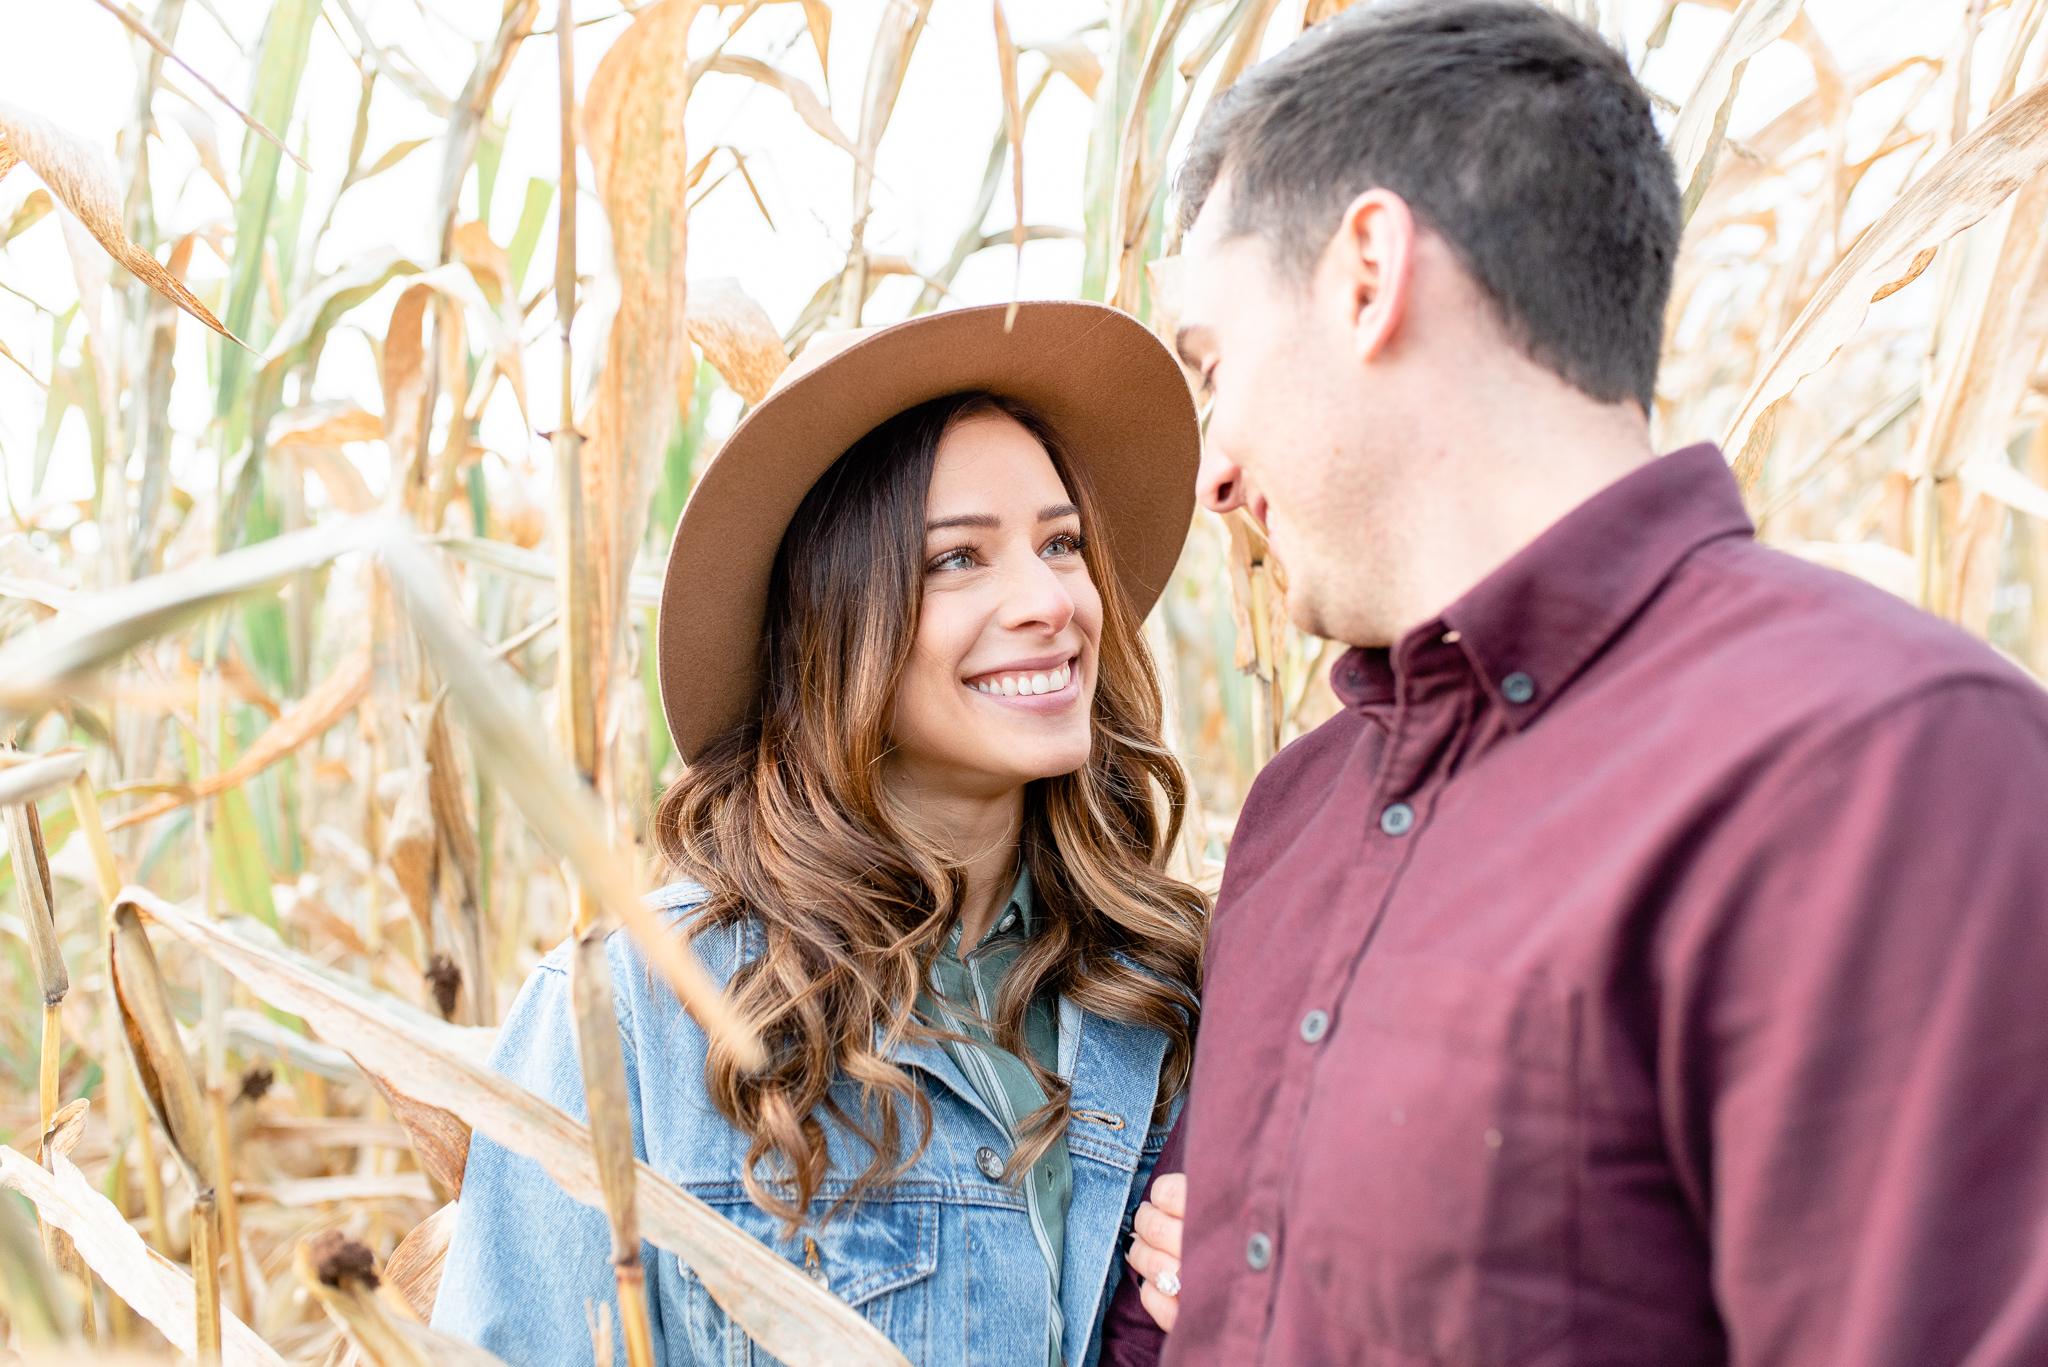 10_19_2018_Dana_Slifer_Photography_B_and_K_Engagement_Session_WEB_32.jpg